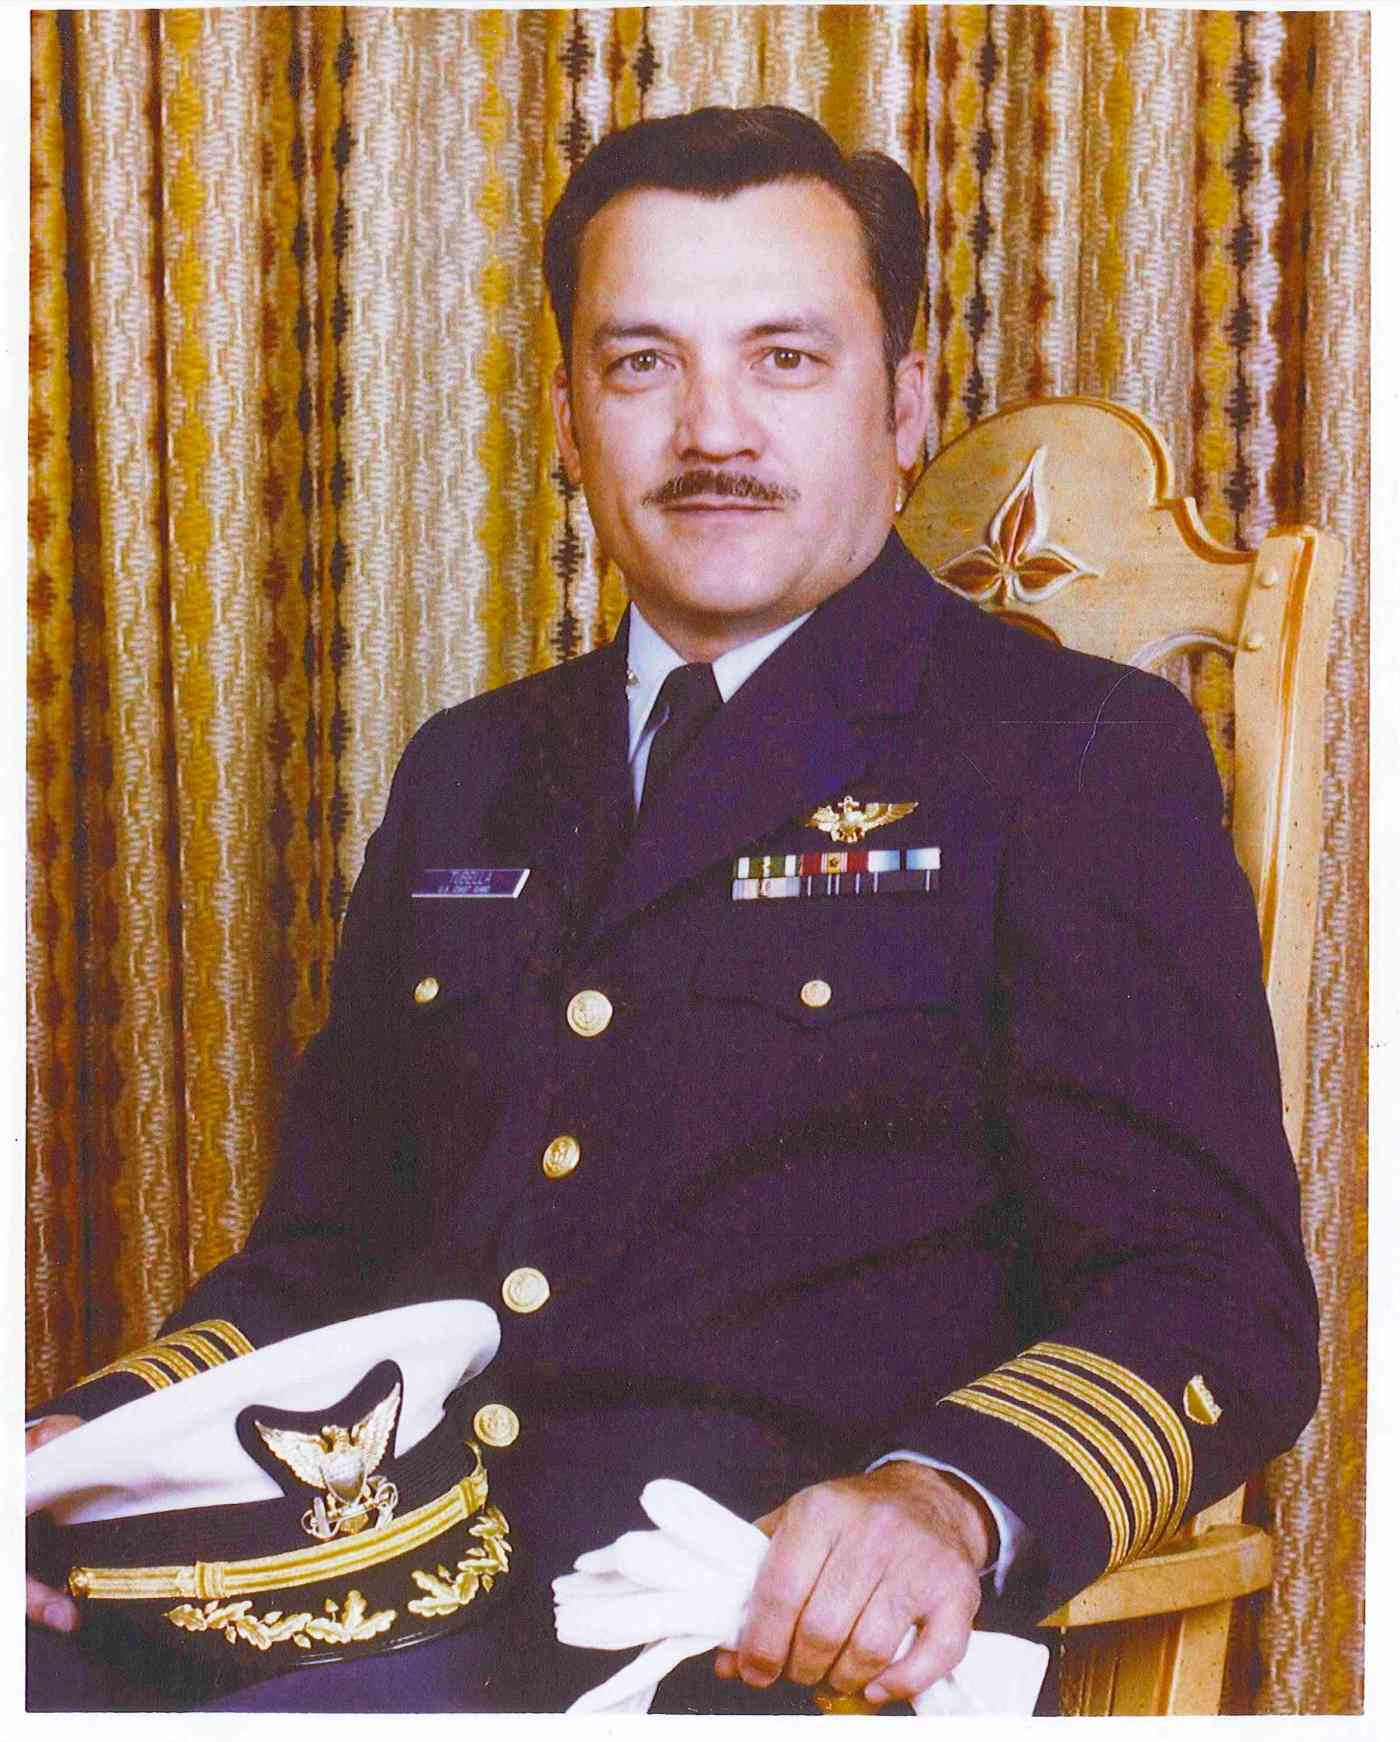 asian american pacific islander history: manuel tubella, jr